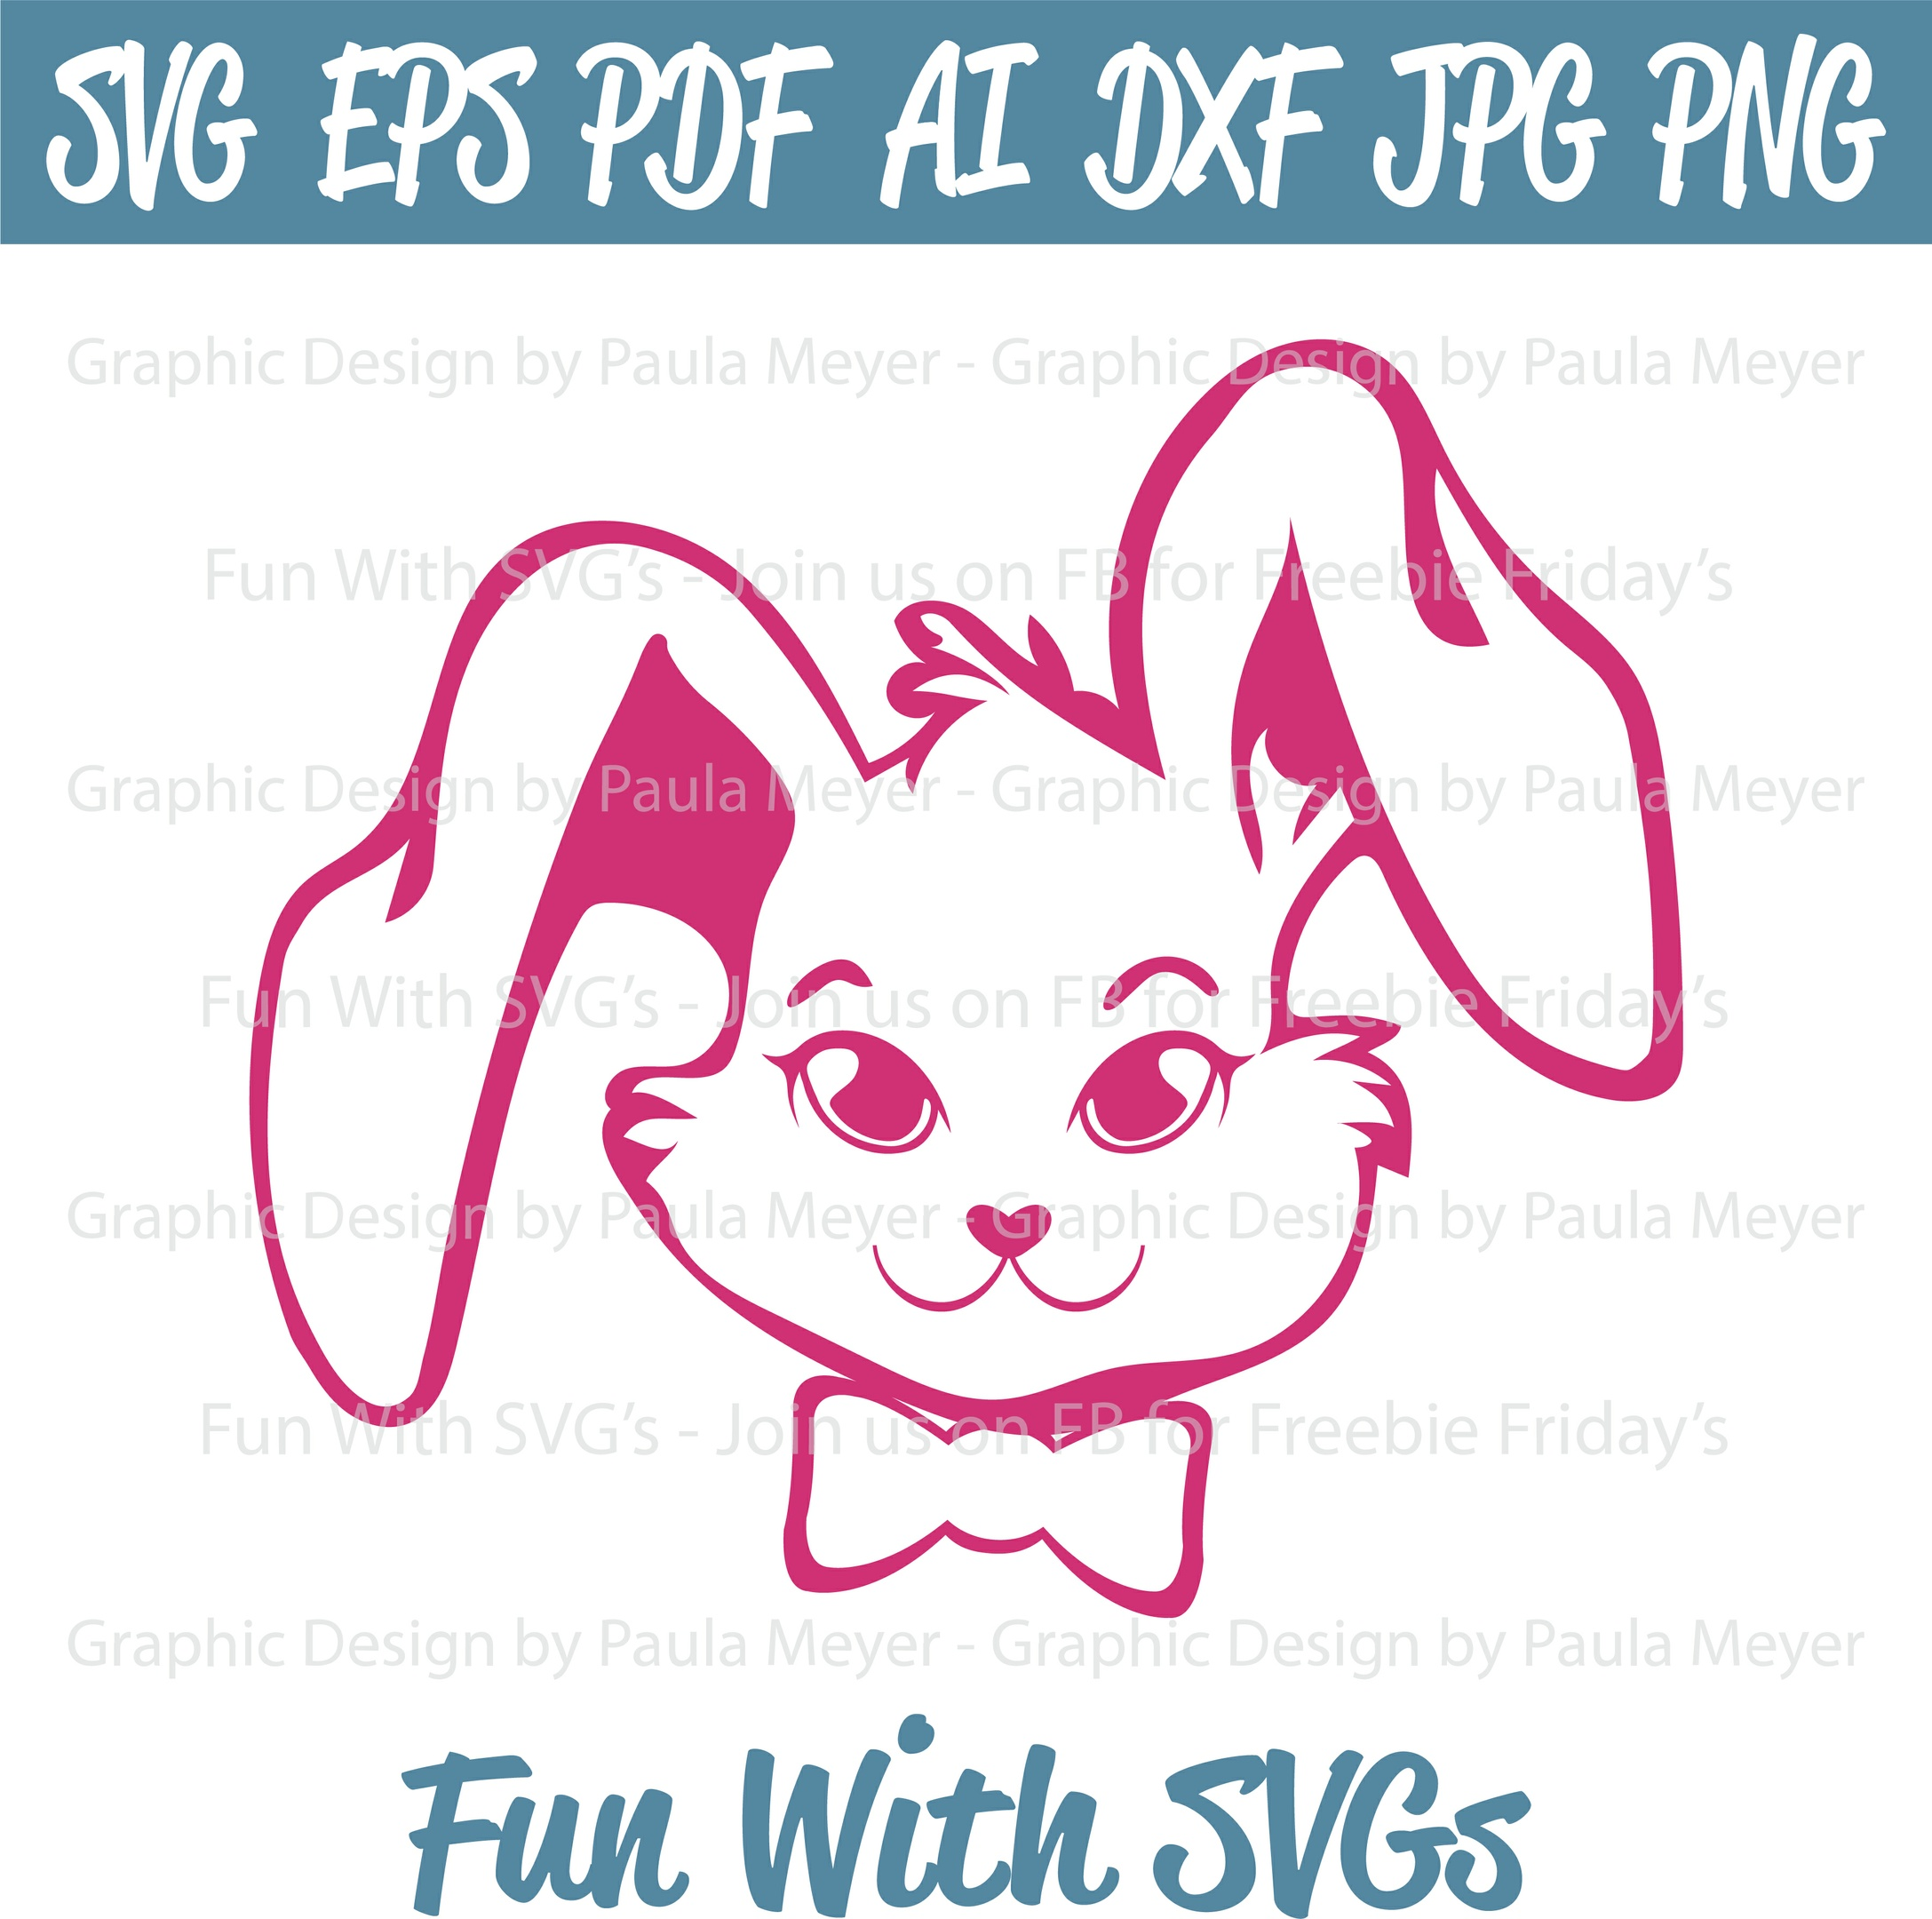 Spring Bunny - SVG Cut File, High Resolution Printable Graphics and Editable Vector Art